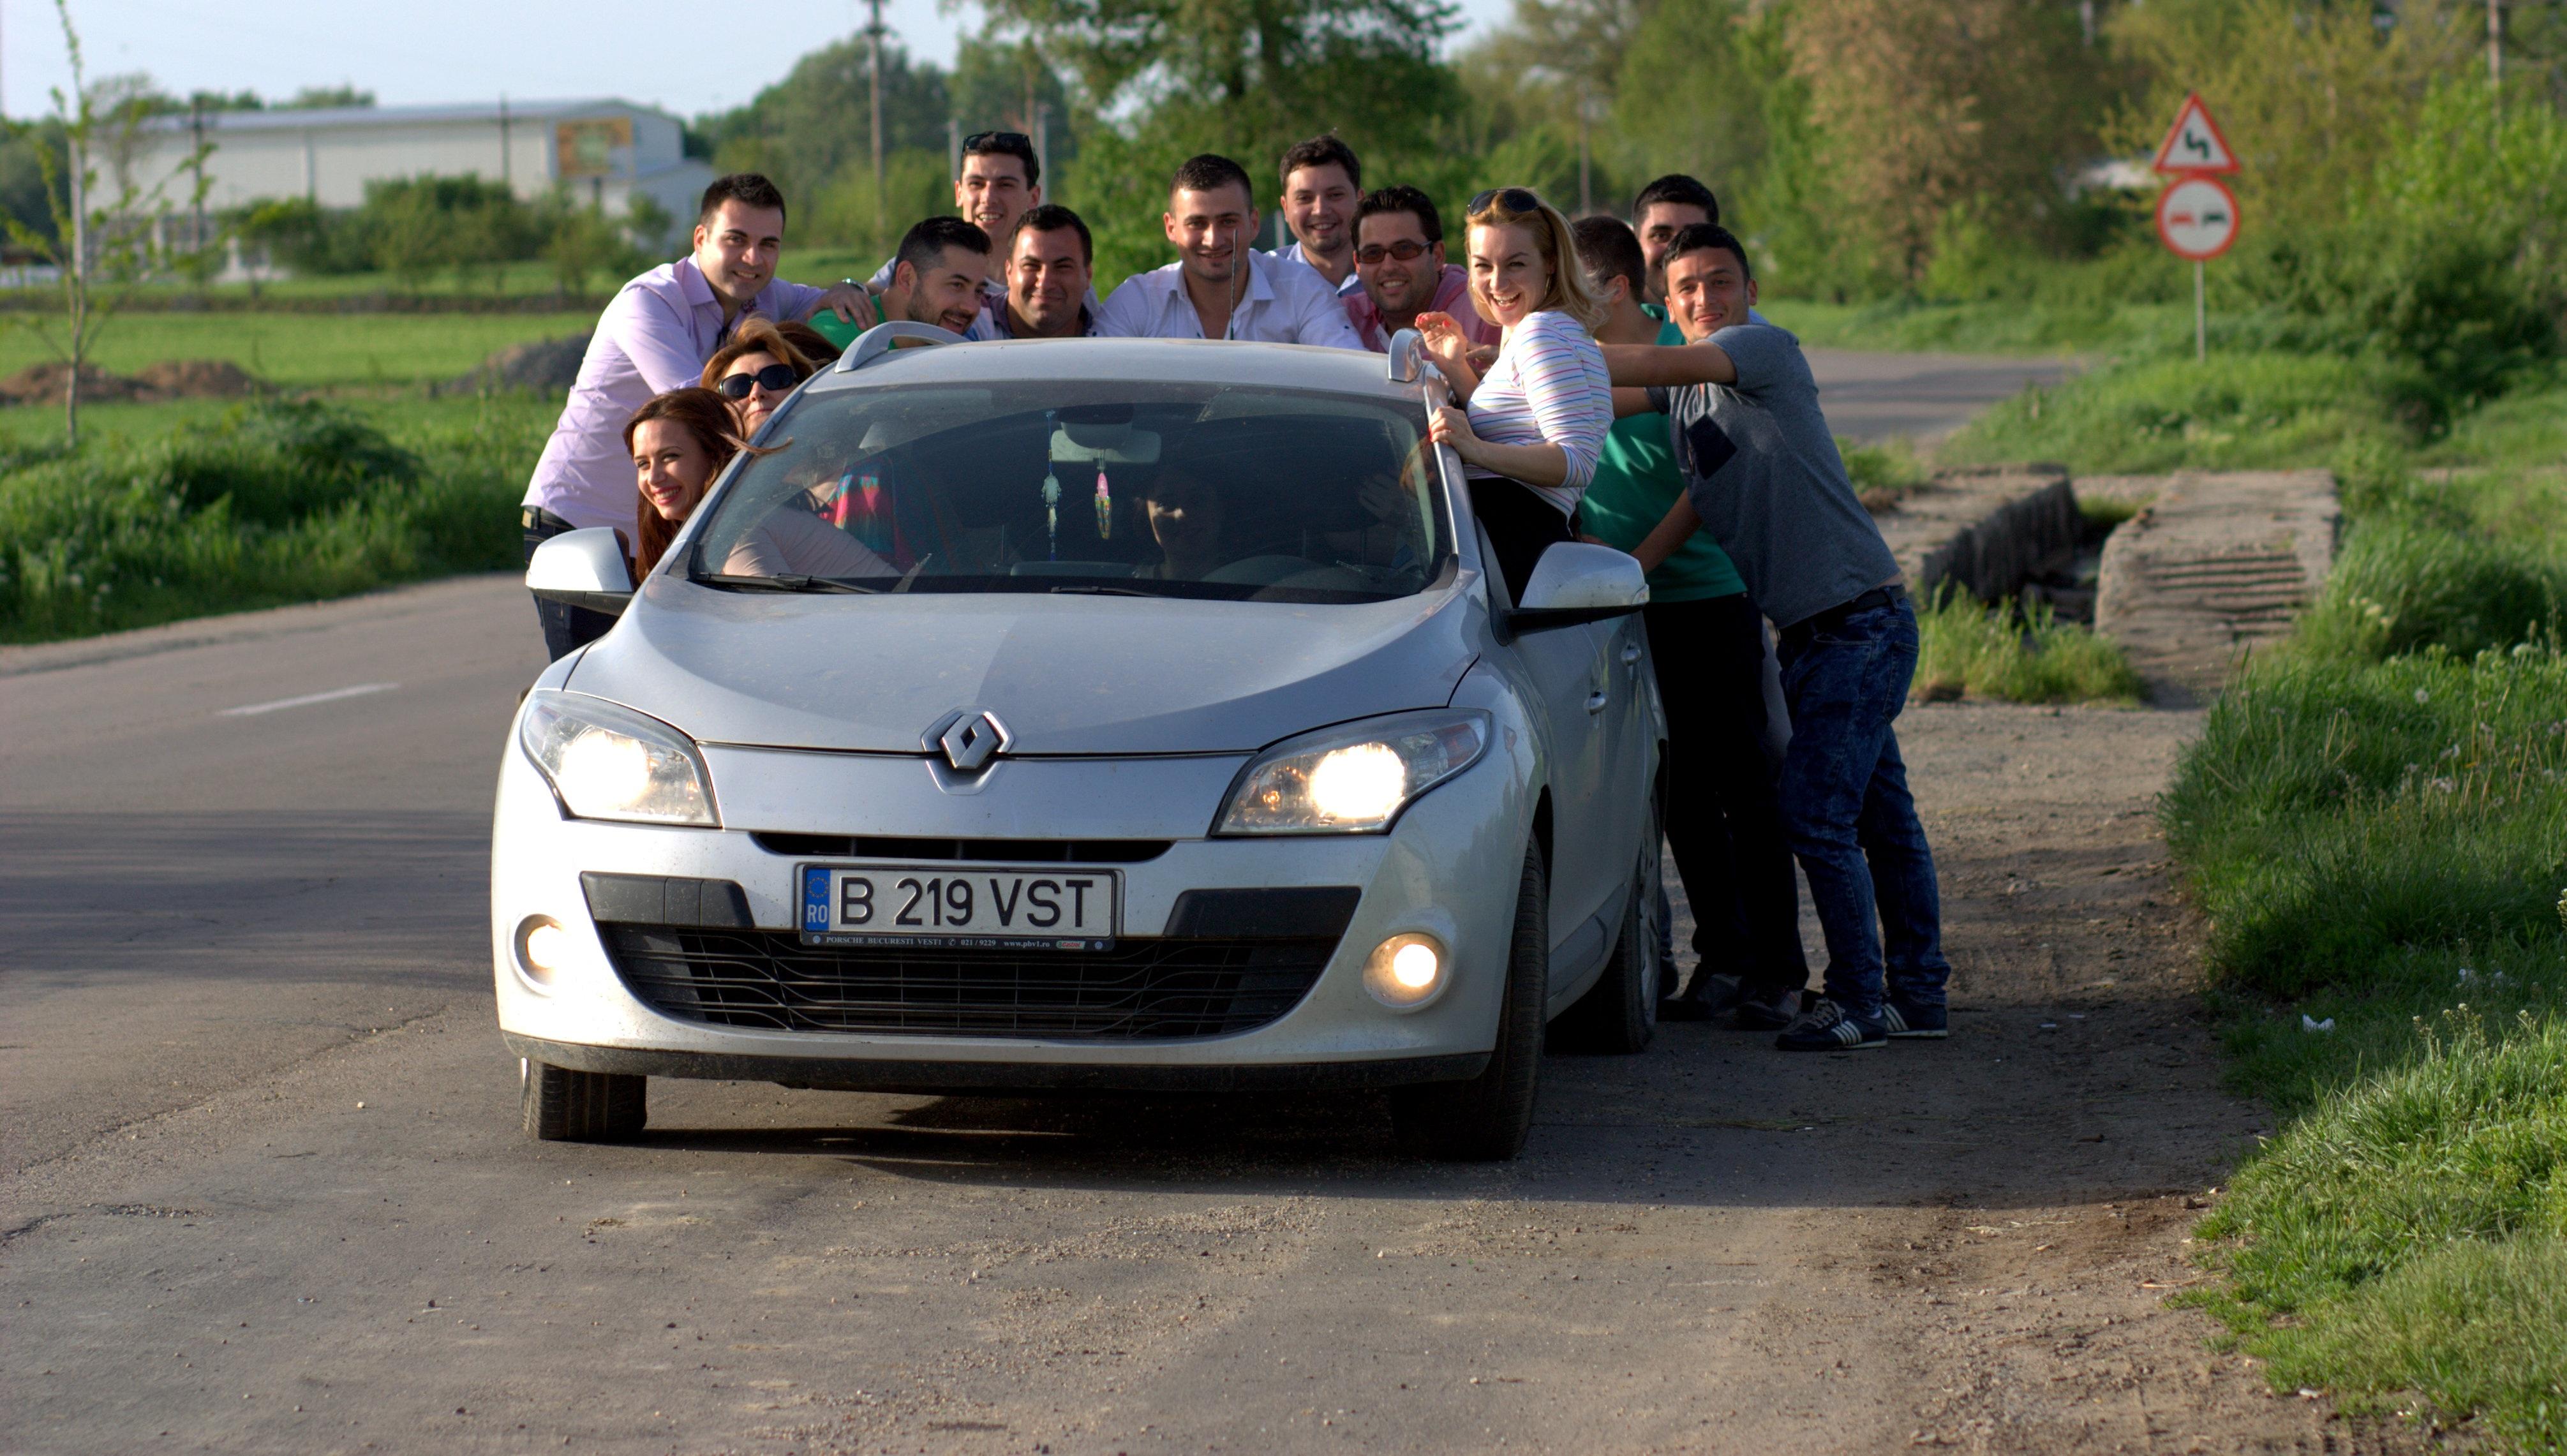 43 Koleksi Gambar Mobil Sedan Lucu HD